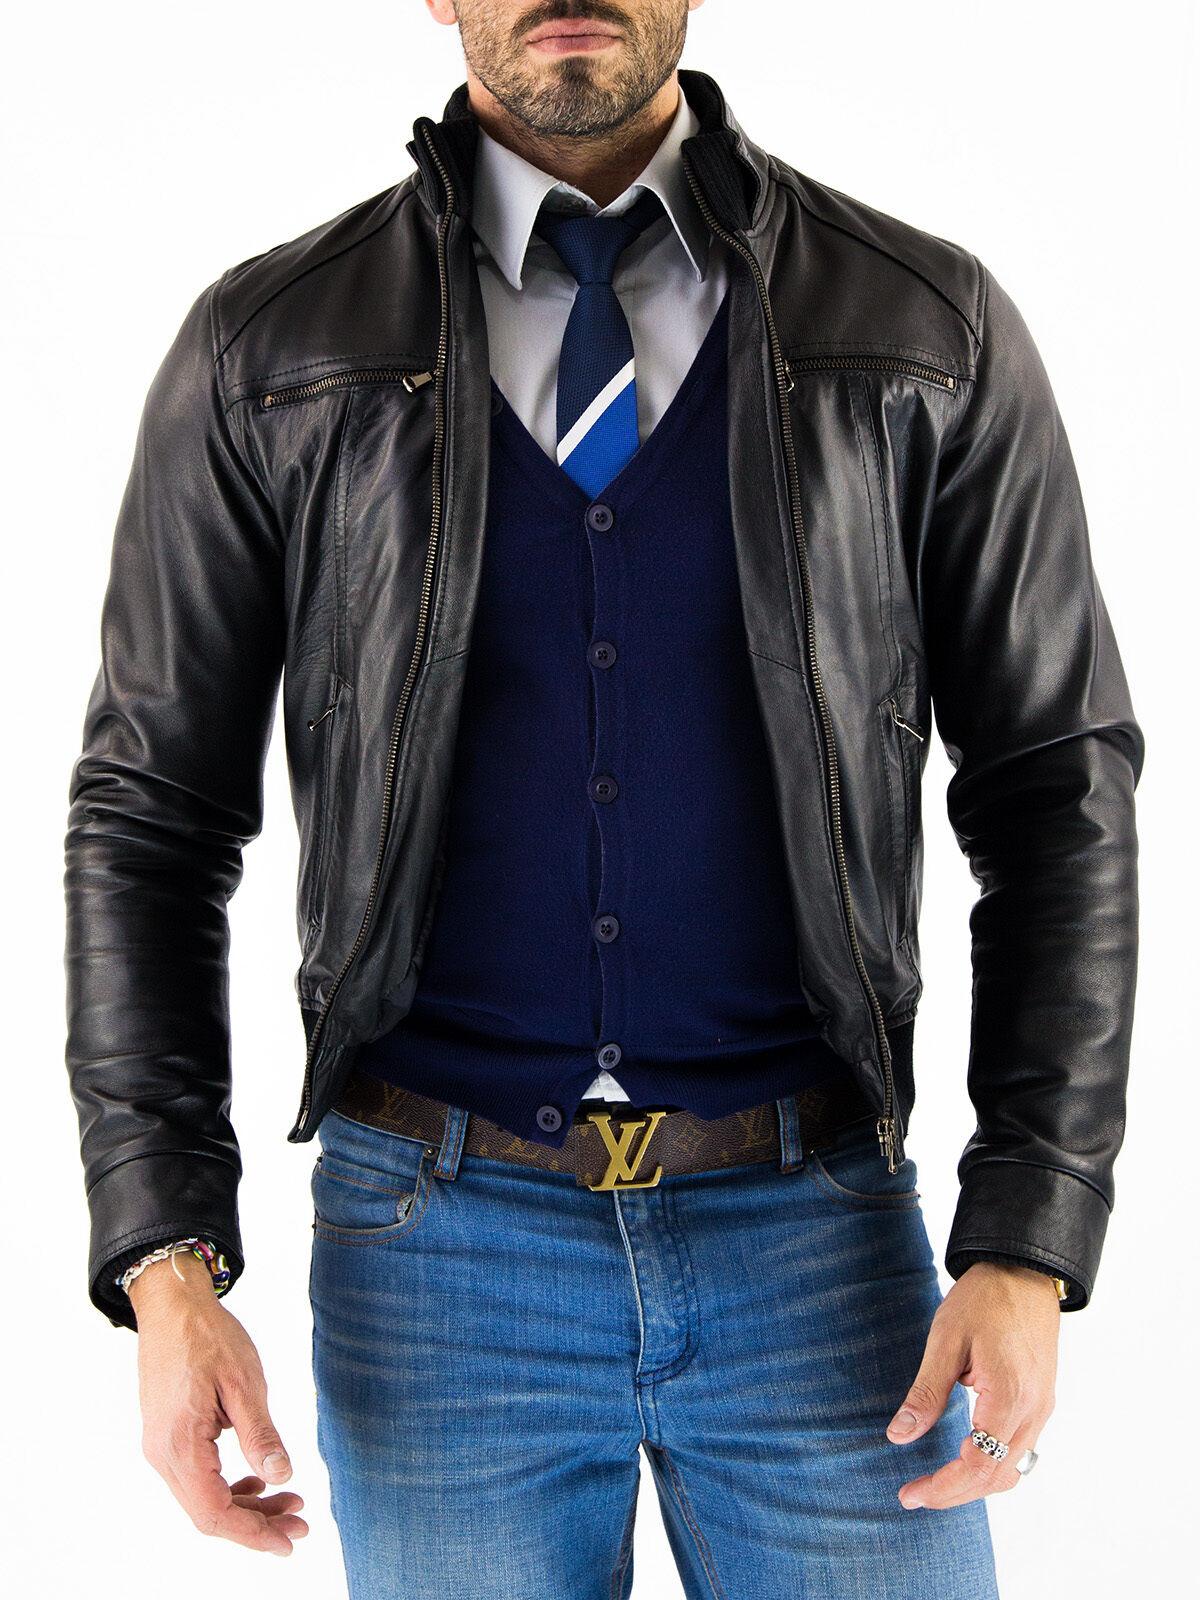 DE Herren Lederjacke Biker Férfi bőr kabát kabát Homme Veste En cuir T9HYb3